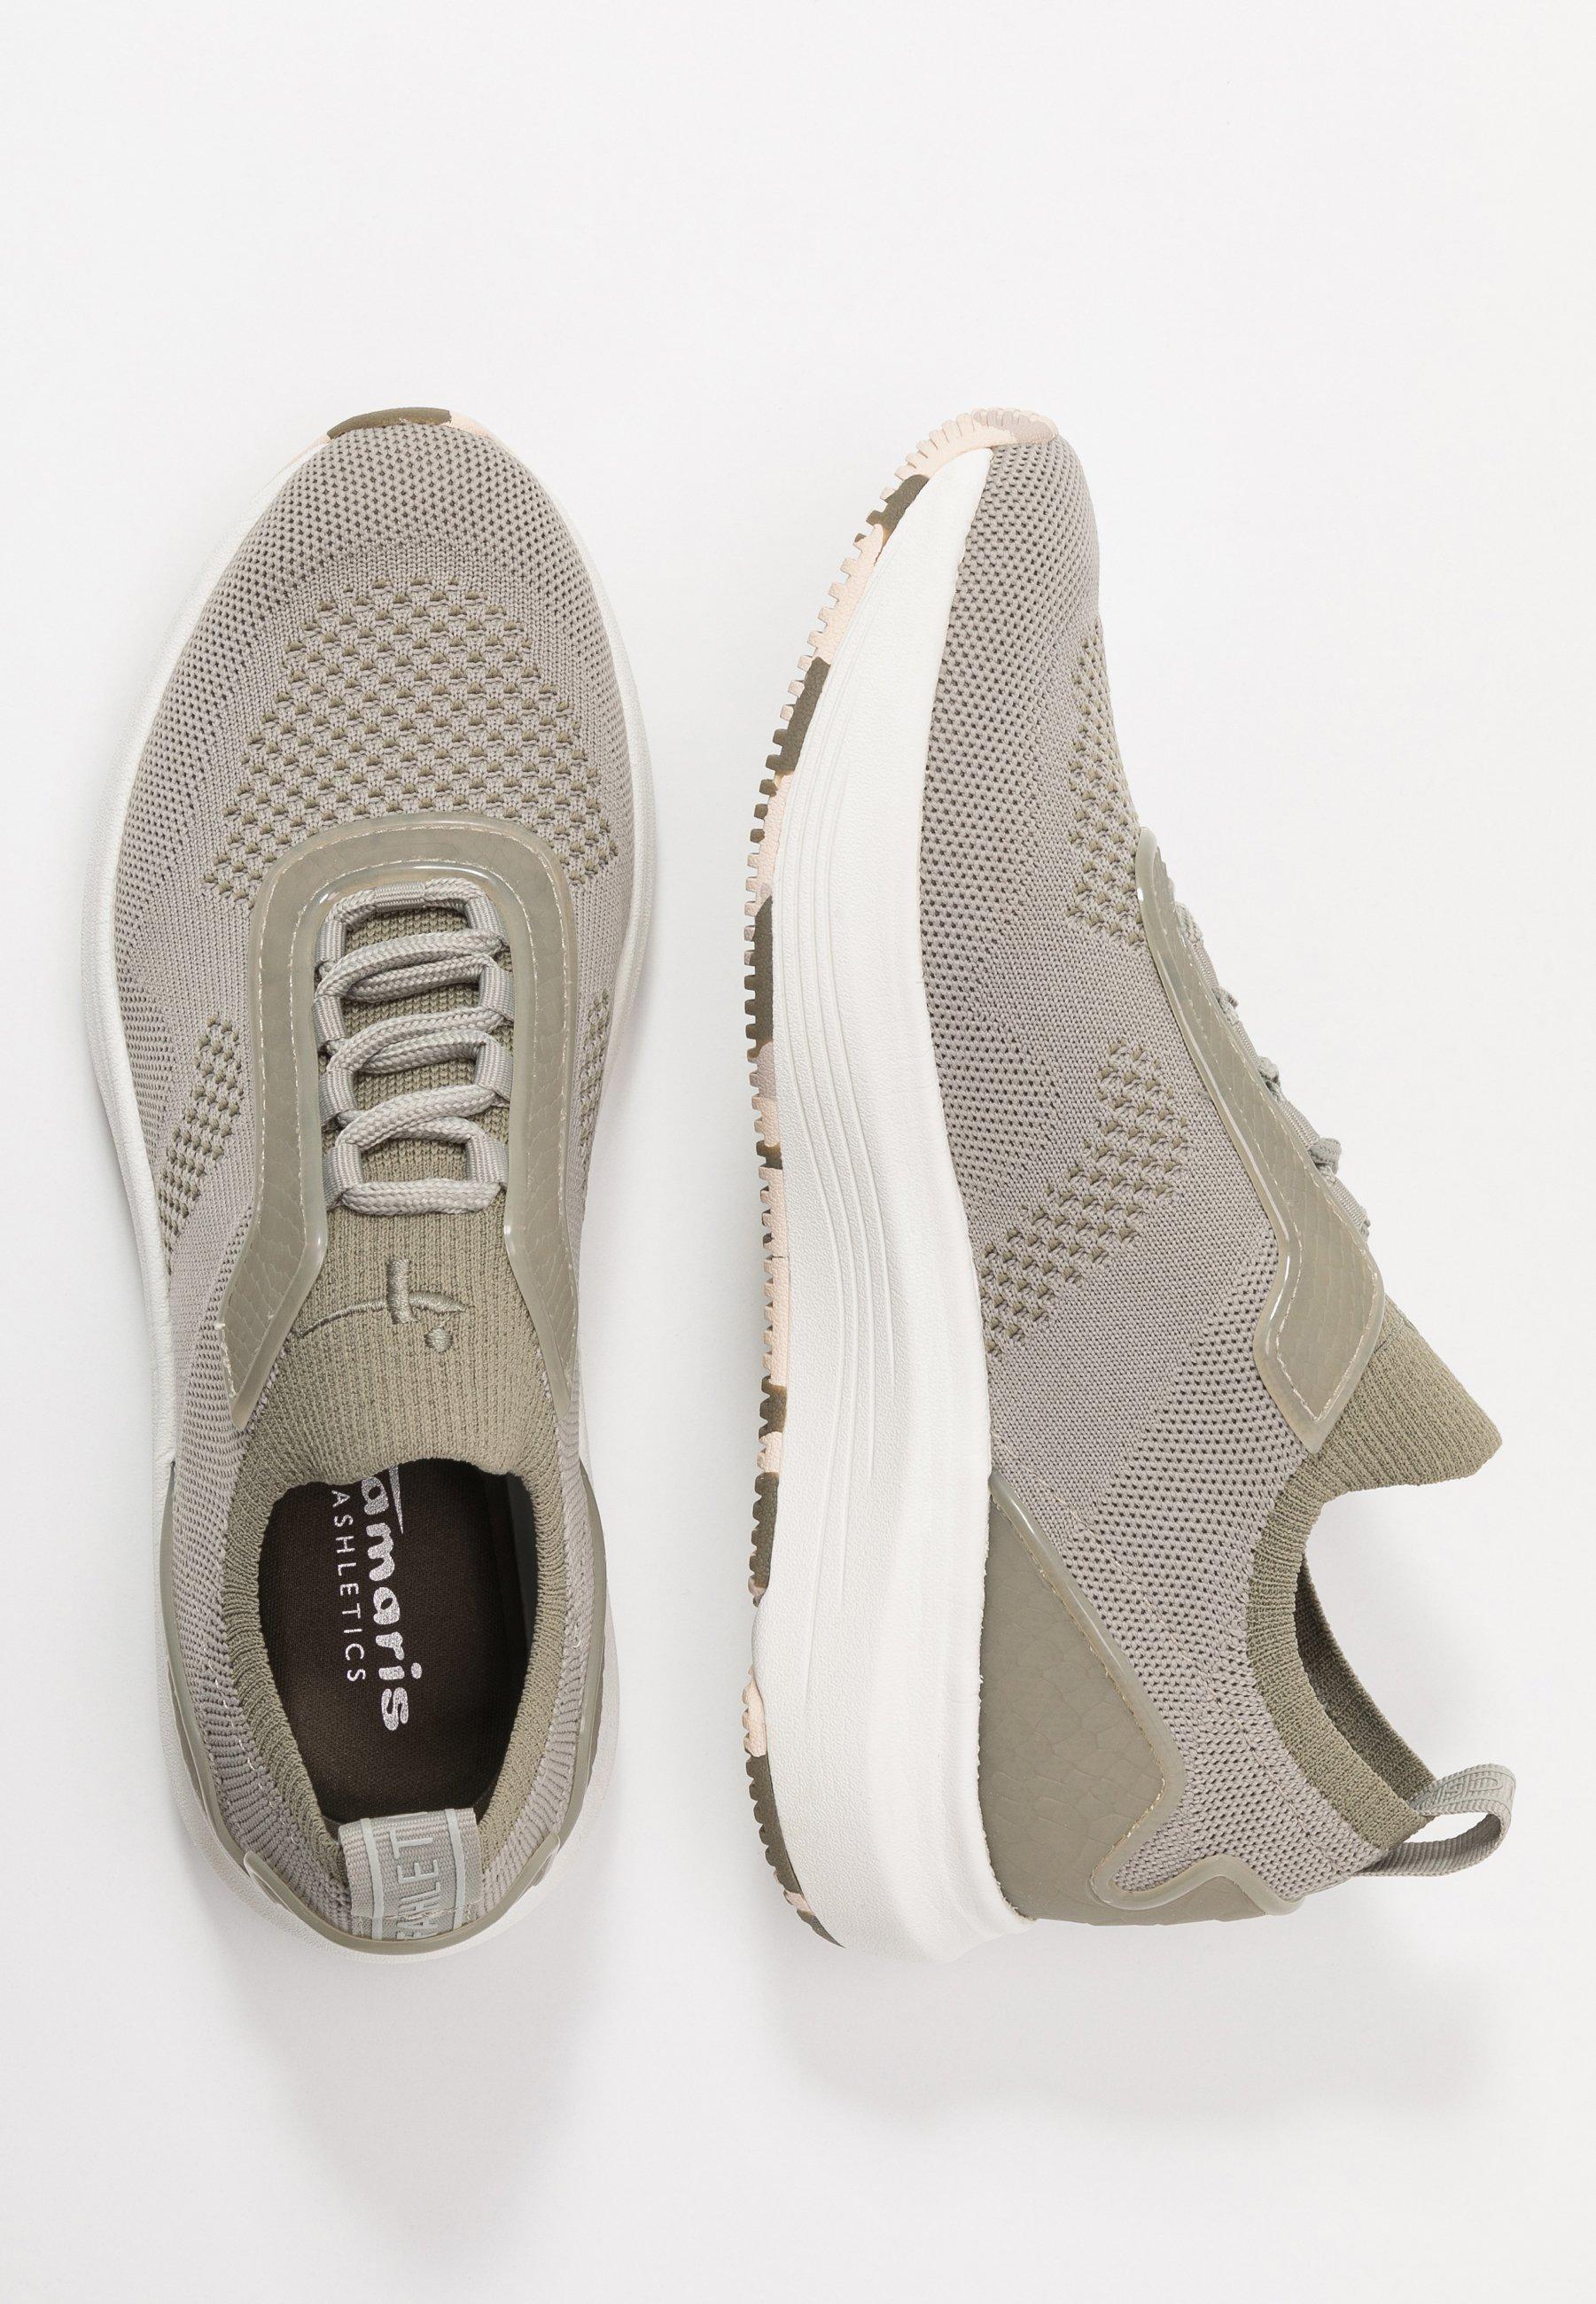 Tamaris Fashletics Lace-up - Sneakers Light Olive